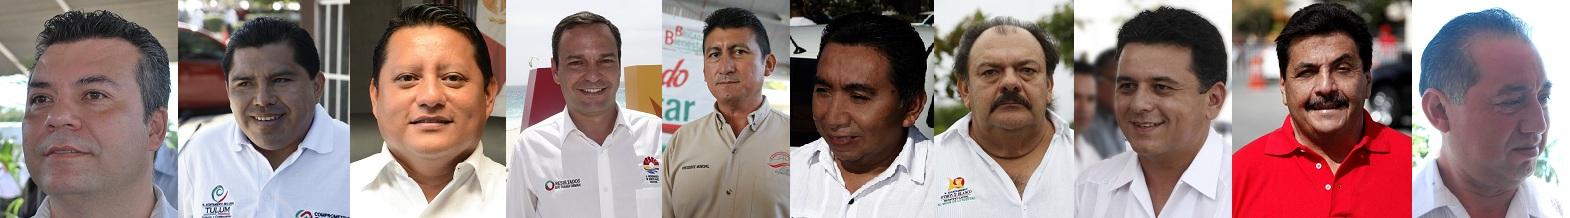 1.-Mauricio Góngora Escalante. Presidente municipal de Solidaridad